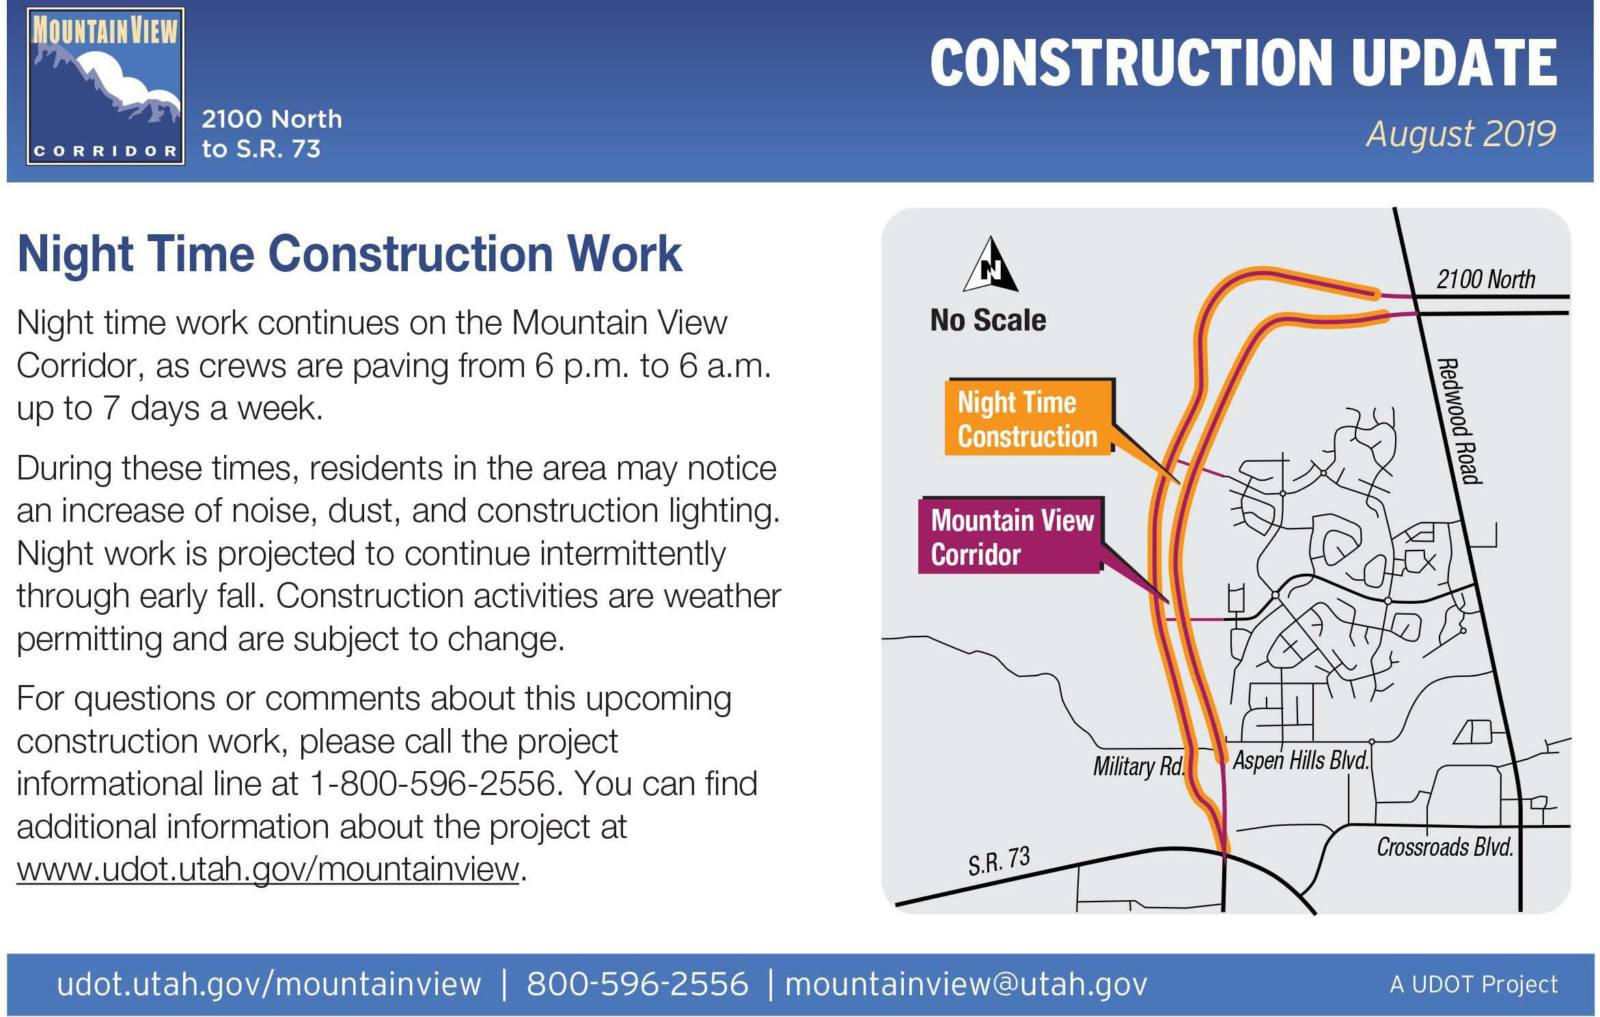 Nighttime Construction Update August 2019